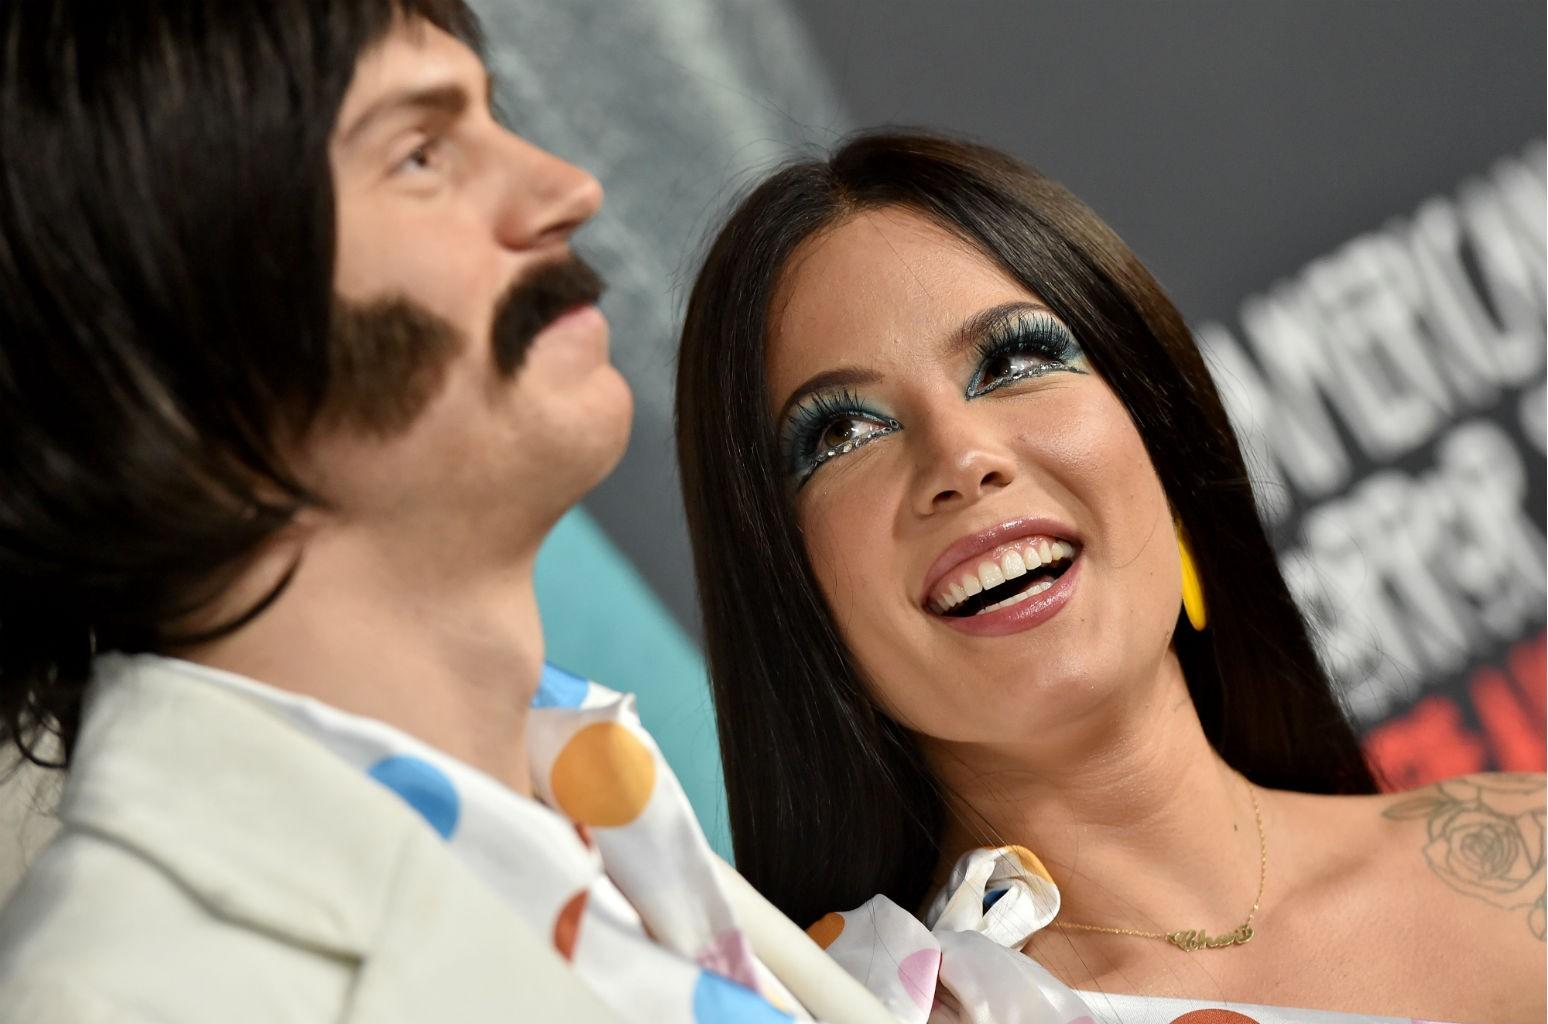 Halsey Evan Peters Dress As Sonny Cher For Halloween See Photos Billboard Billboard